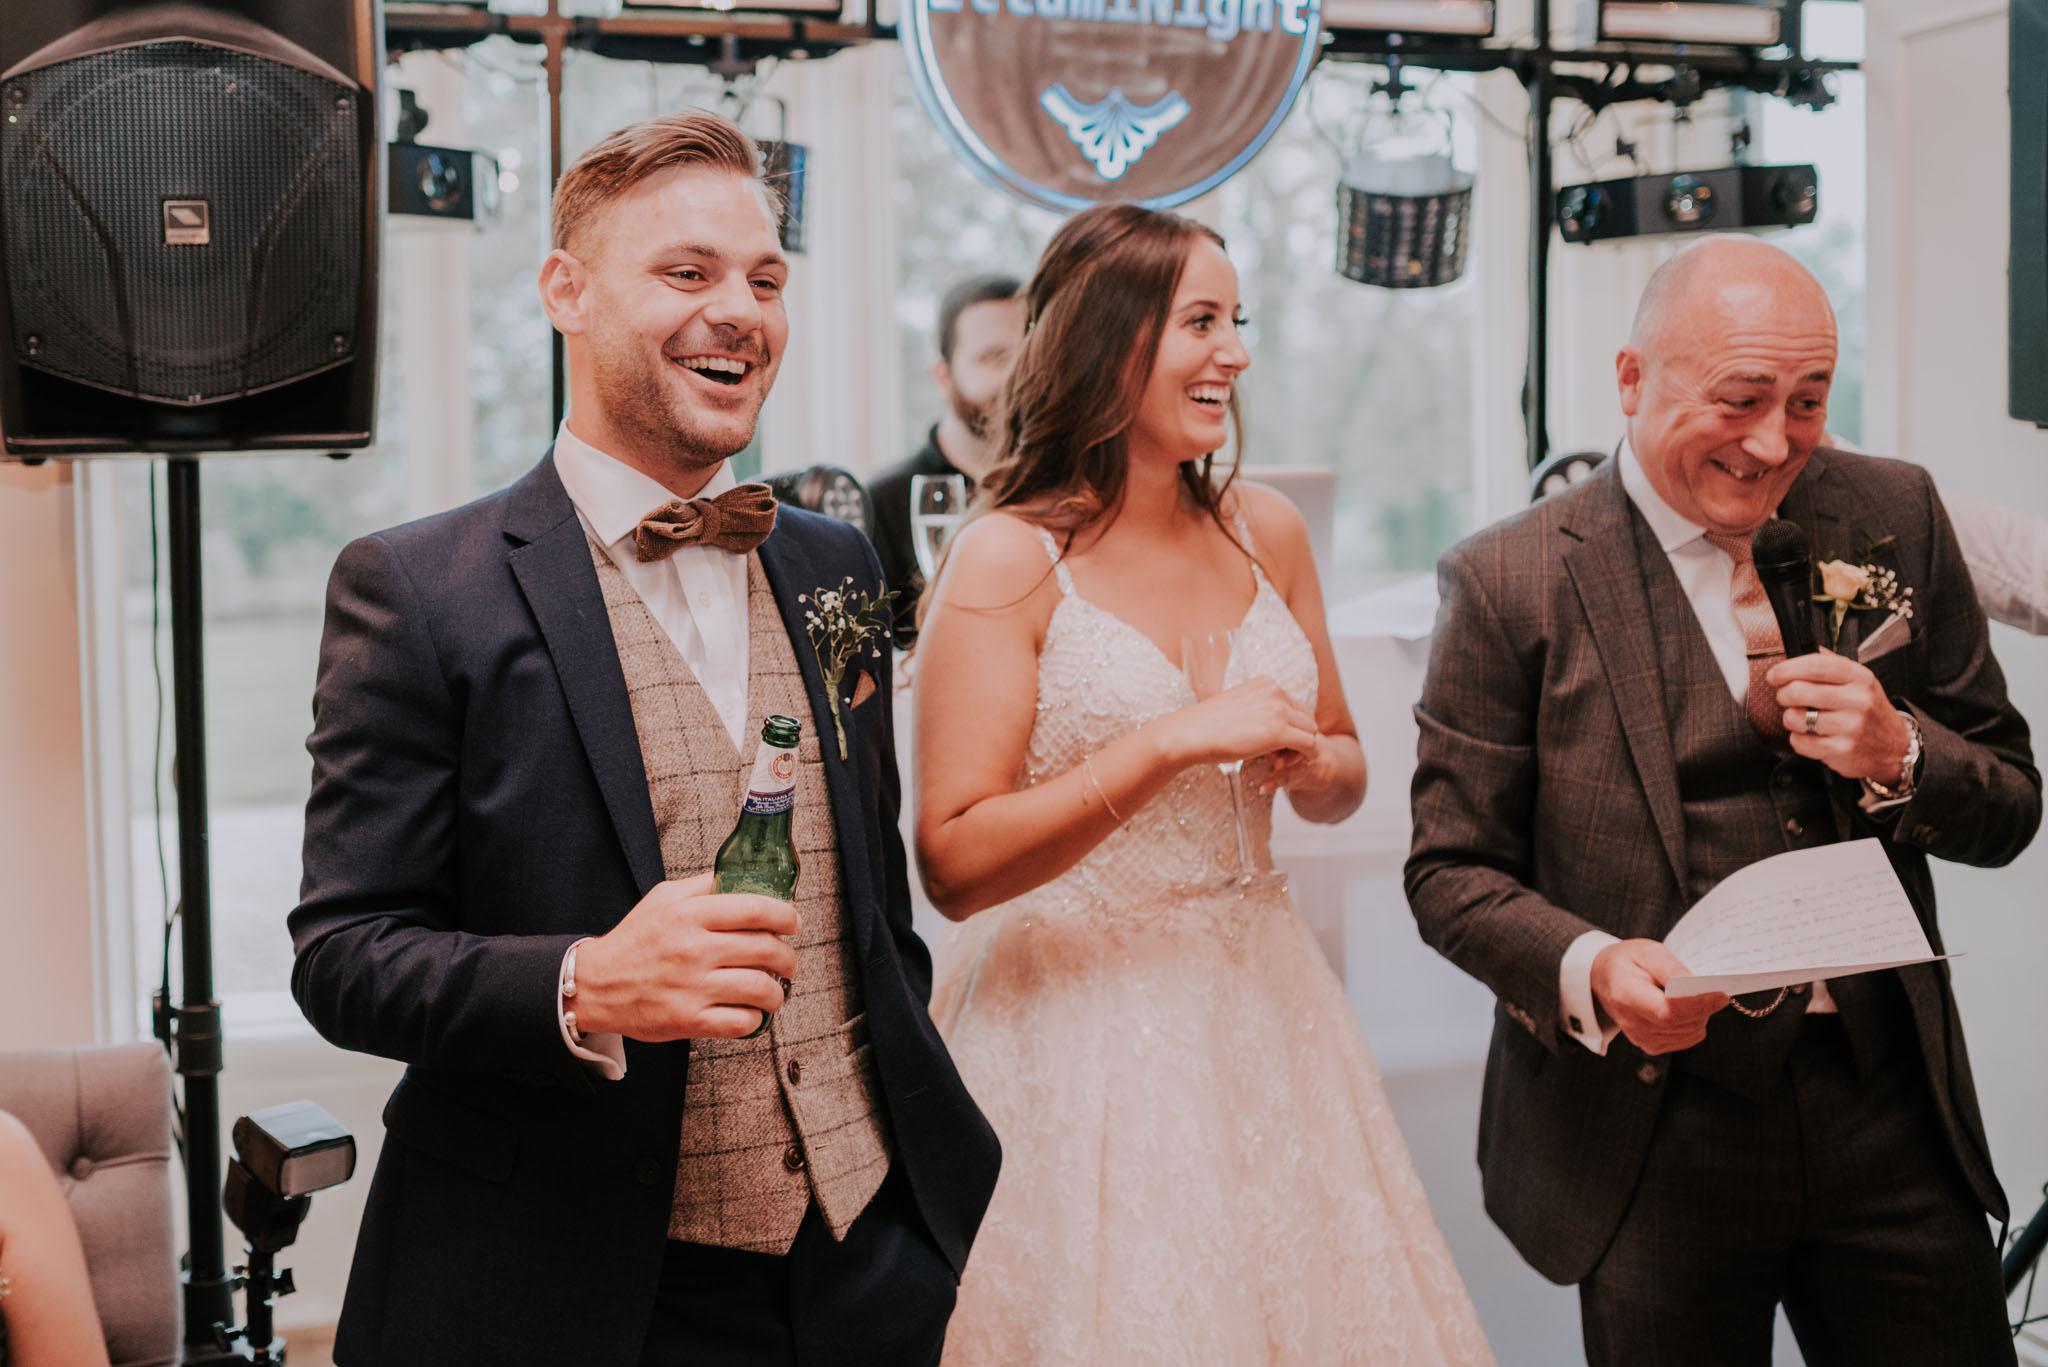 wedding-photographer-glewstone-court-hereford-scott-stockwell-photography419.jpg